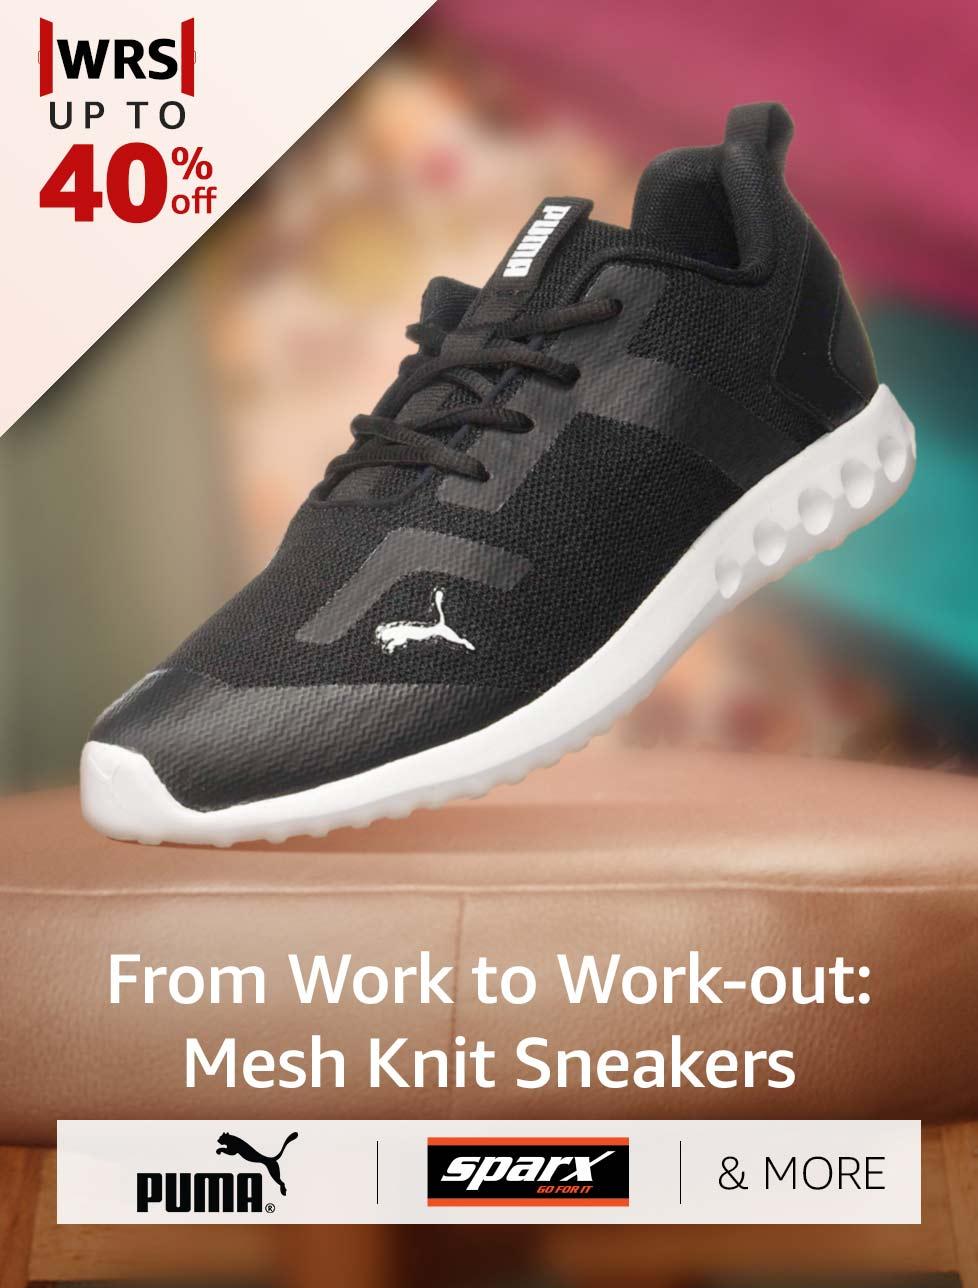 Mesh Knit Sneakers